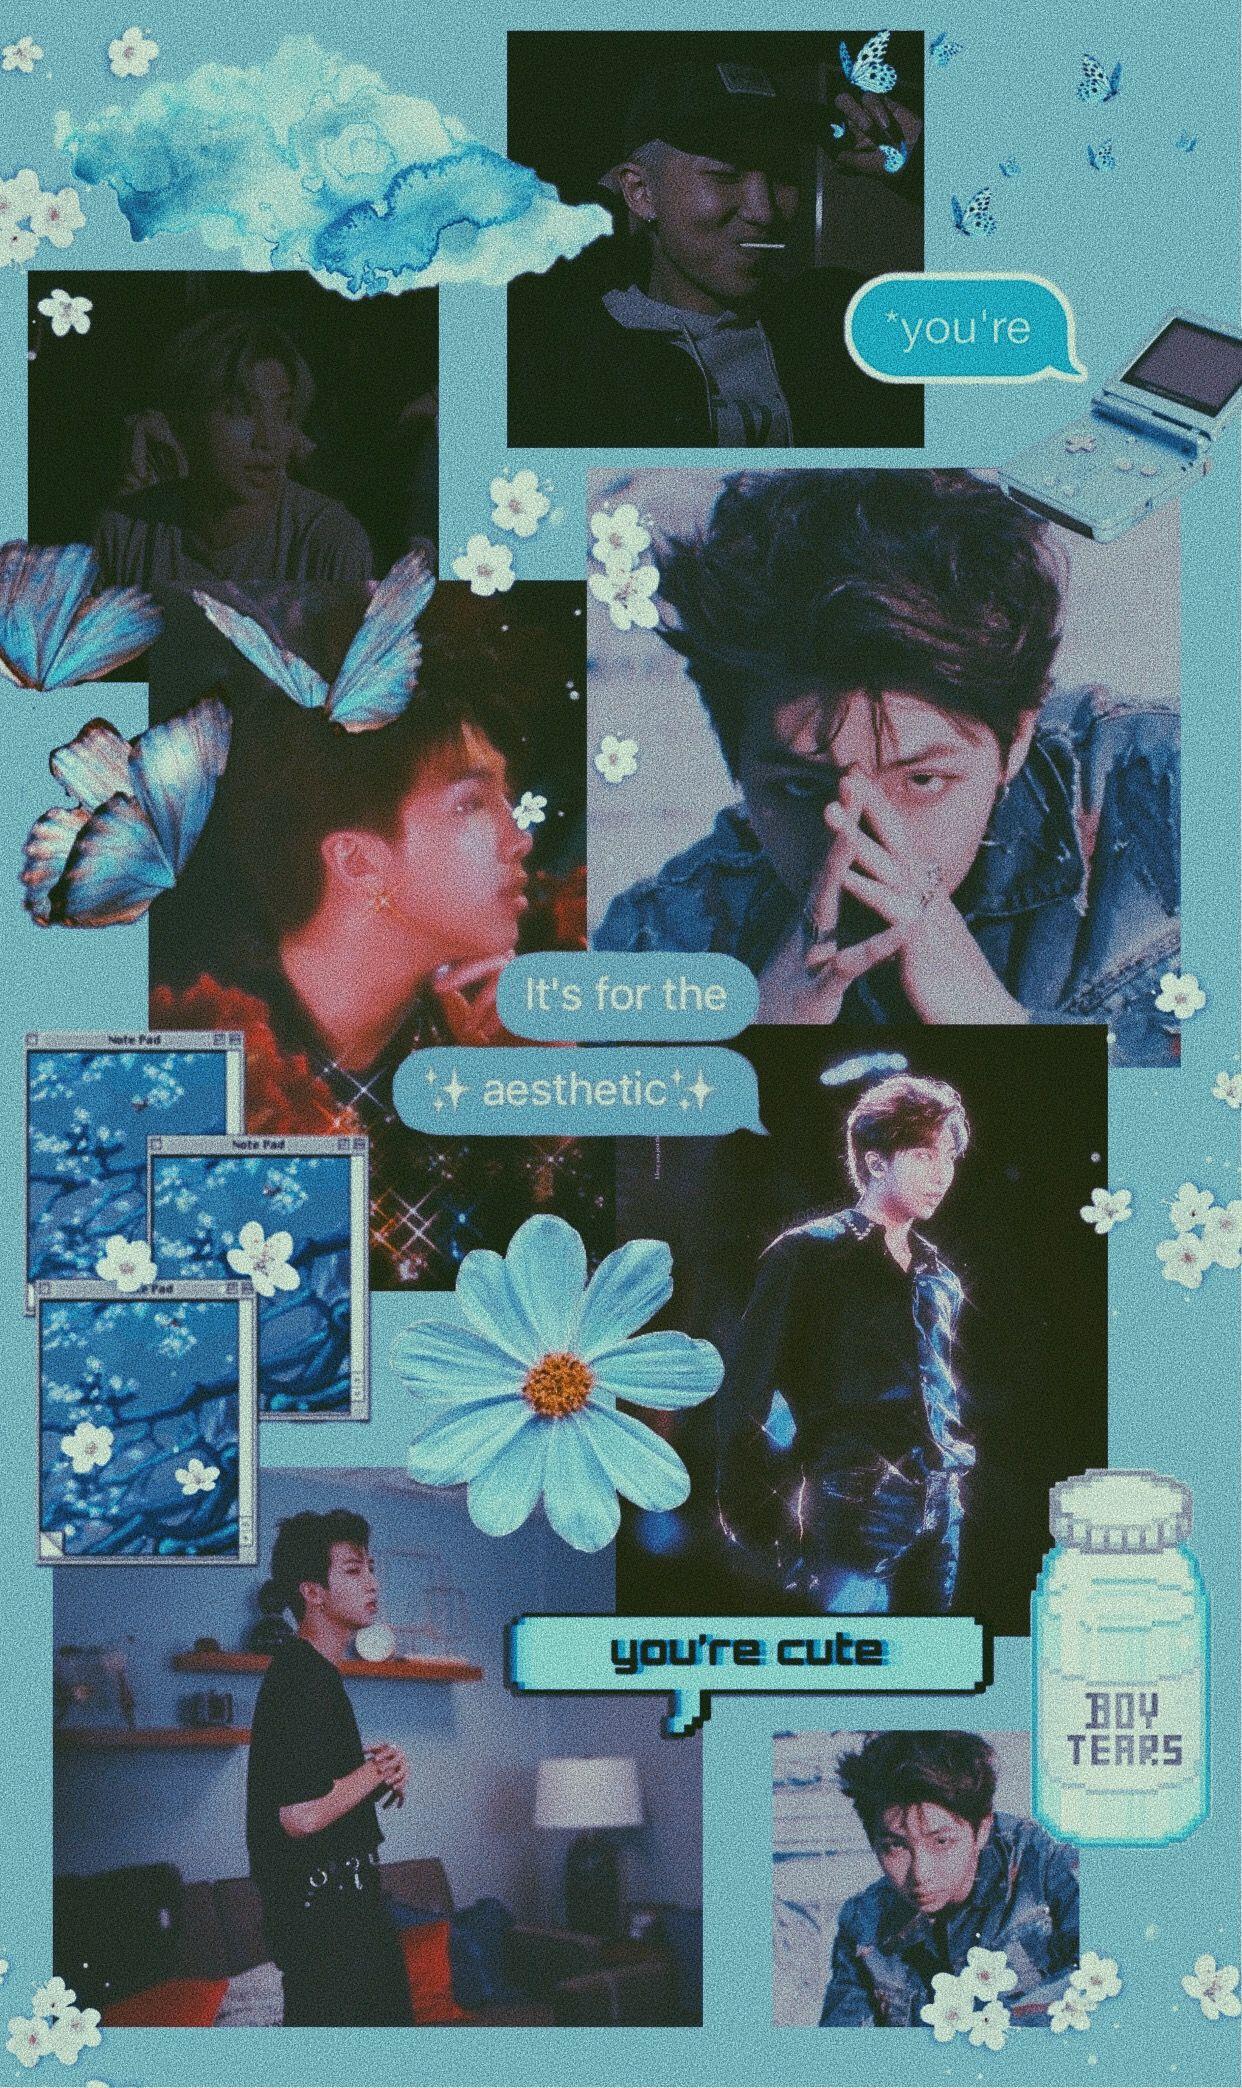 Bts Namjoon Rm Blue Aesthetic Wallpaper Background Gambar Wallpaper Lucu Lucu Wallpaper aesthetic rm bts